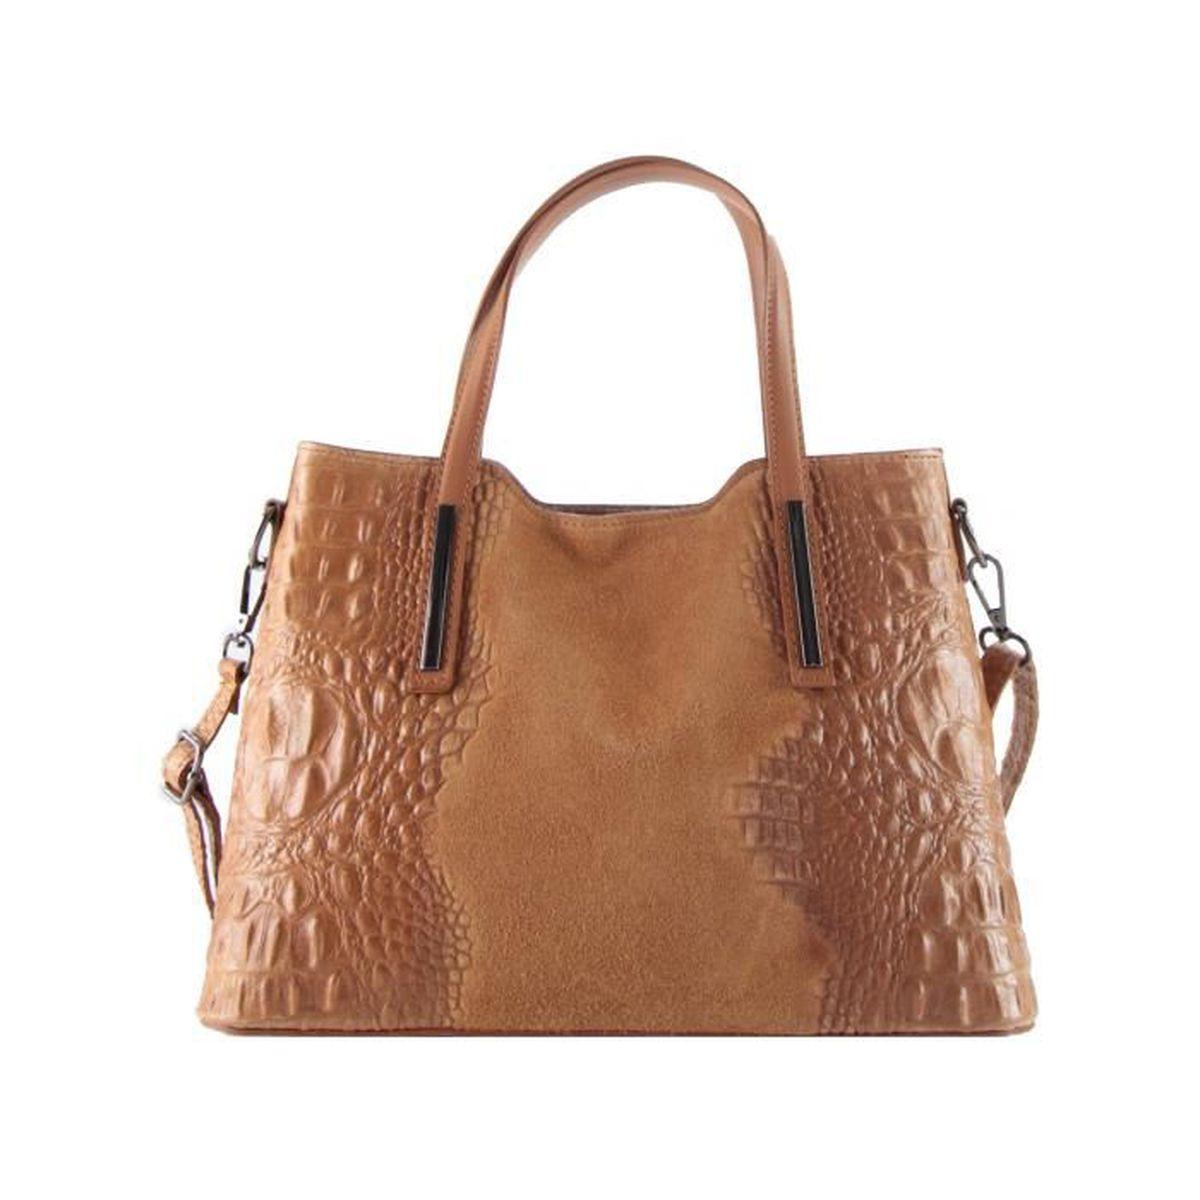 sac a main femme cuir camel achat vente sac a main. Black Bedroom Furniture Sets. Home Design Ideas